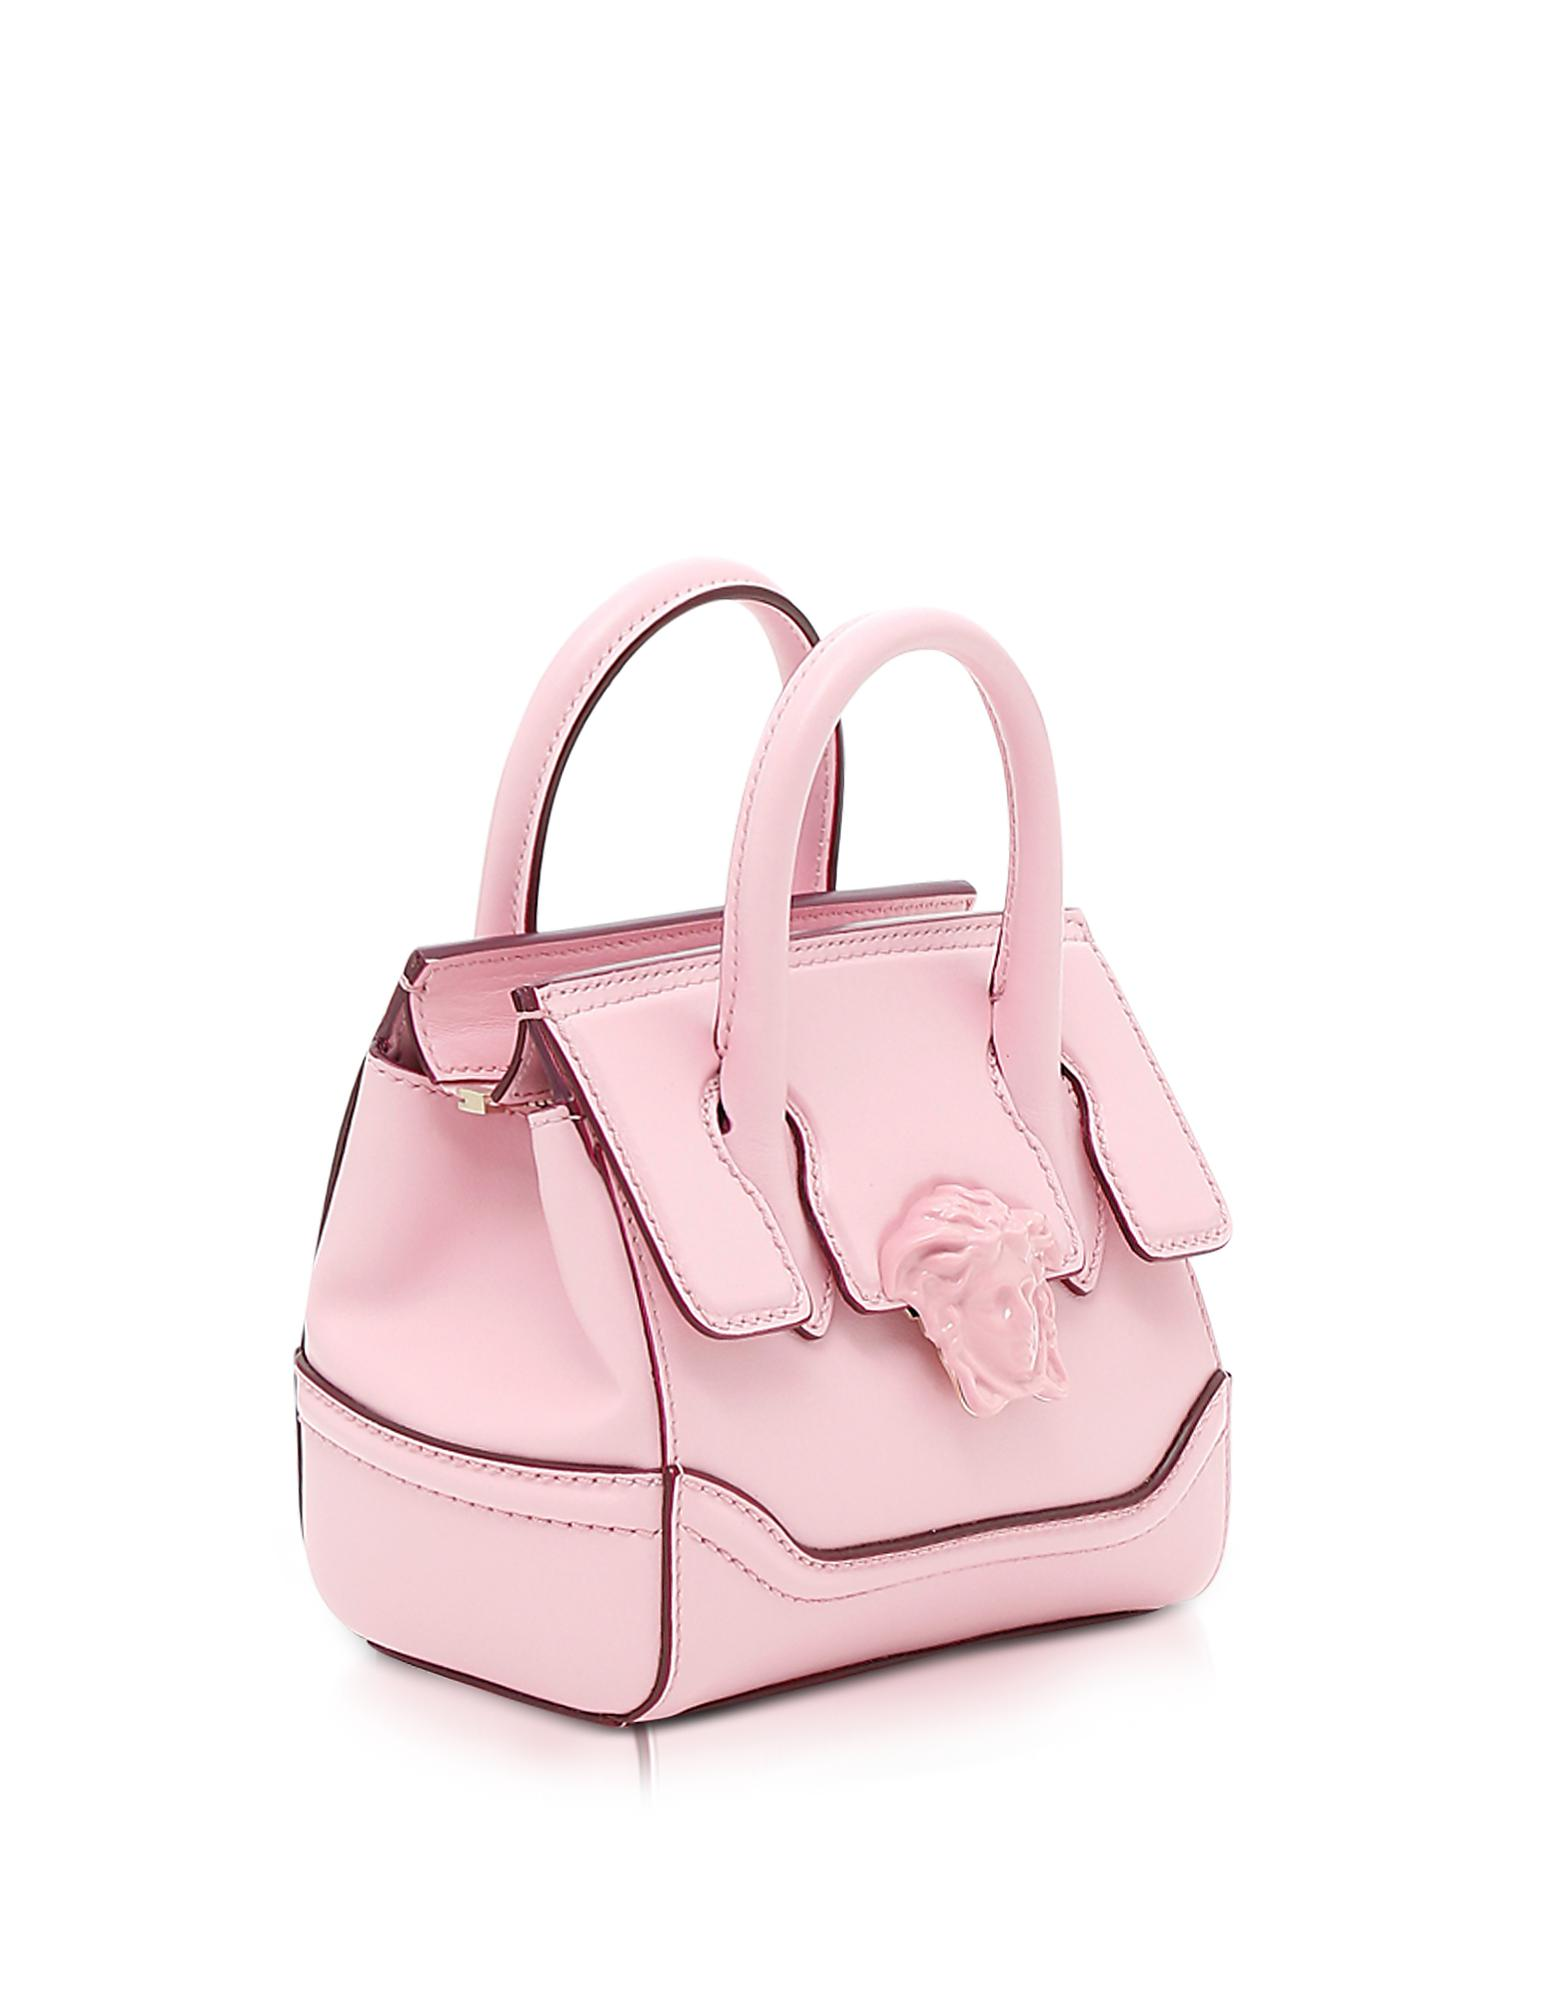 74342ae0eb76 Lyst - Versace Palazzo Empire Pink Leather Mini Handbag in Pink